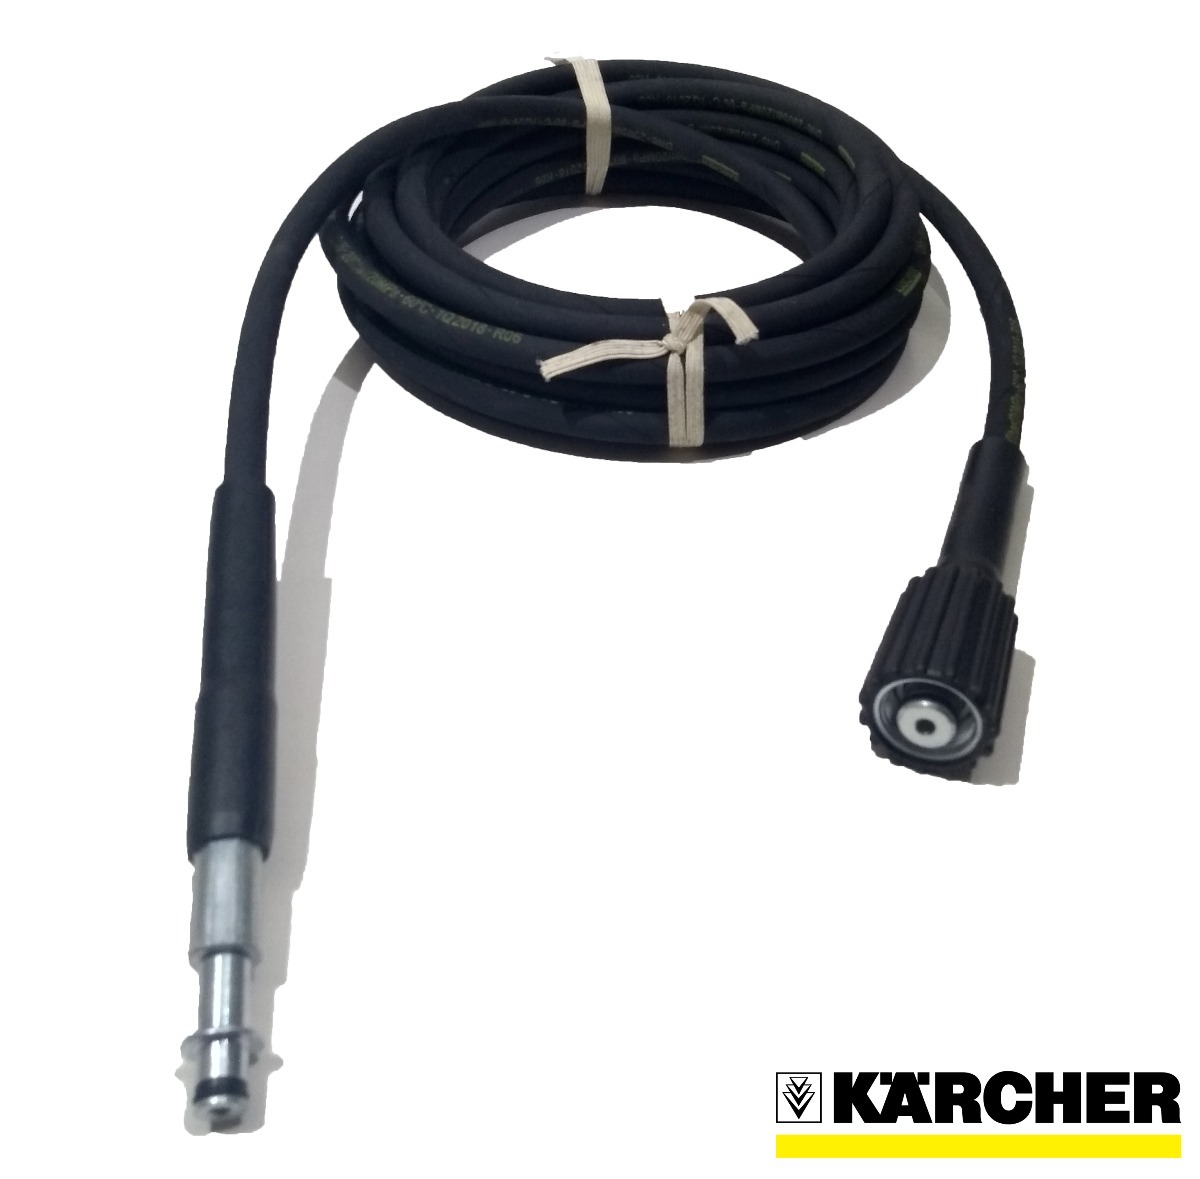 Mangueira Lavadora Karcher HD 585 Trama Aço 7,5m